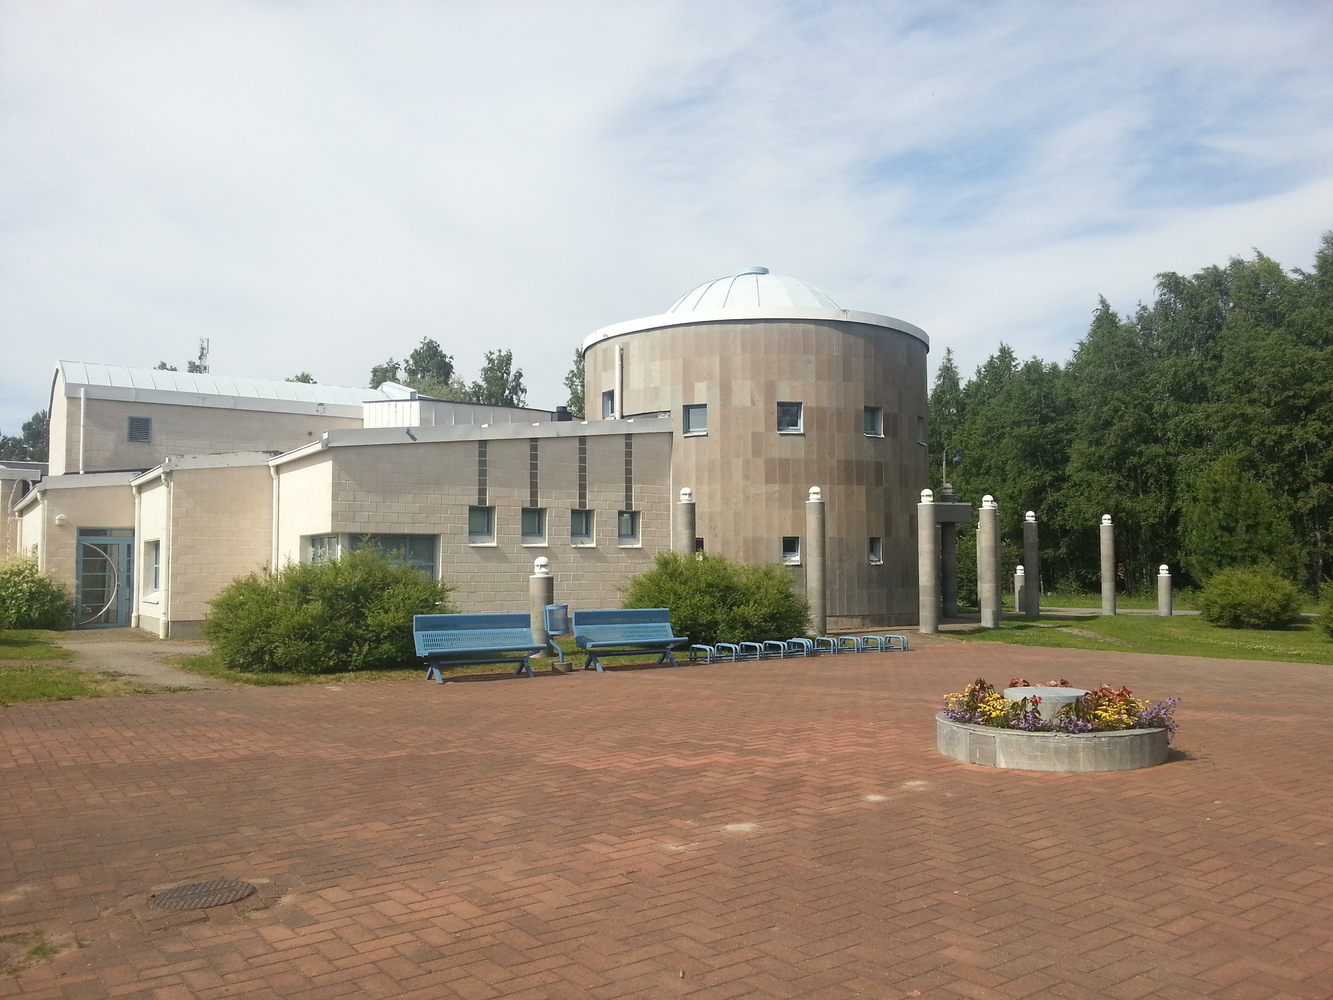 Juuka library